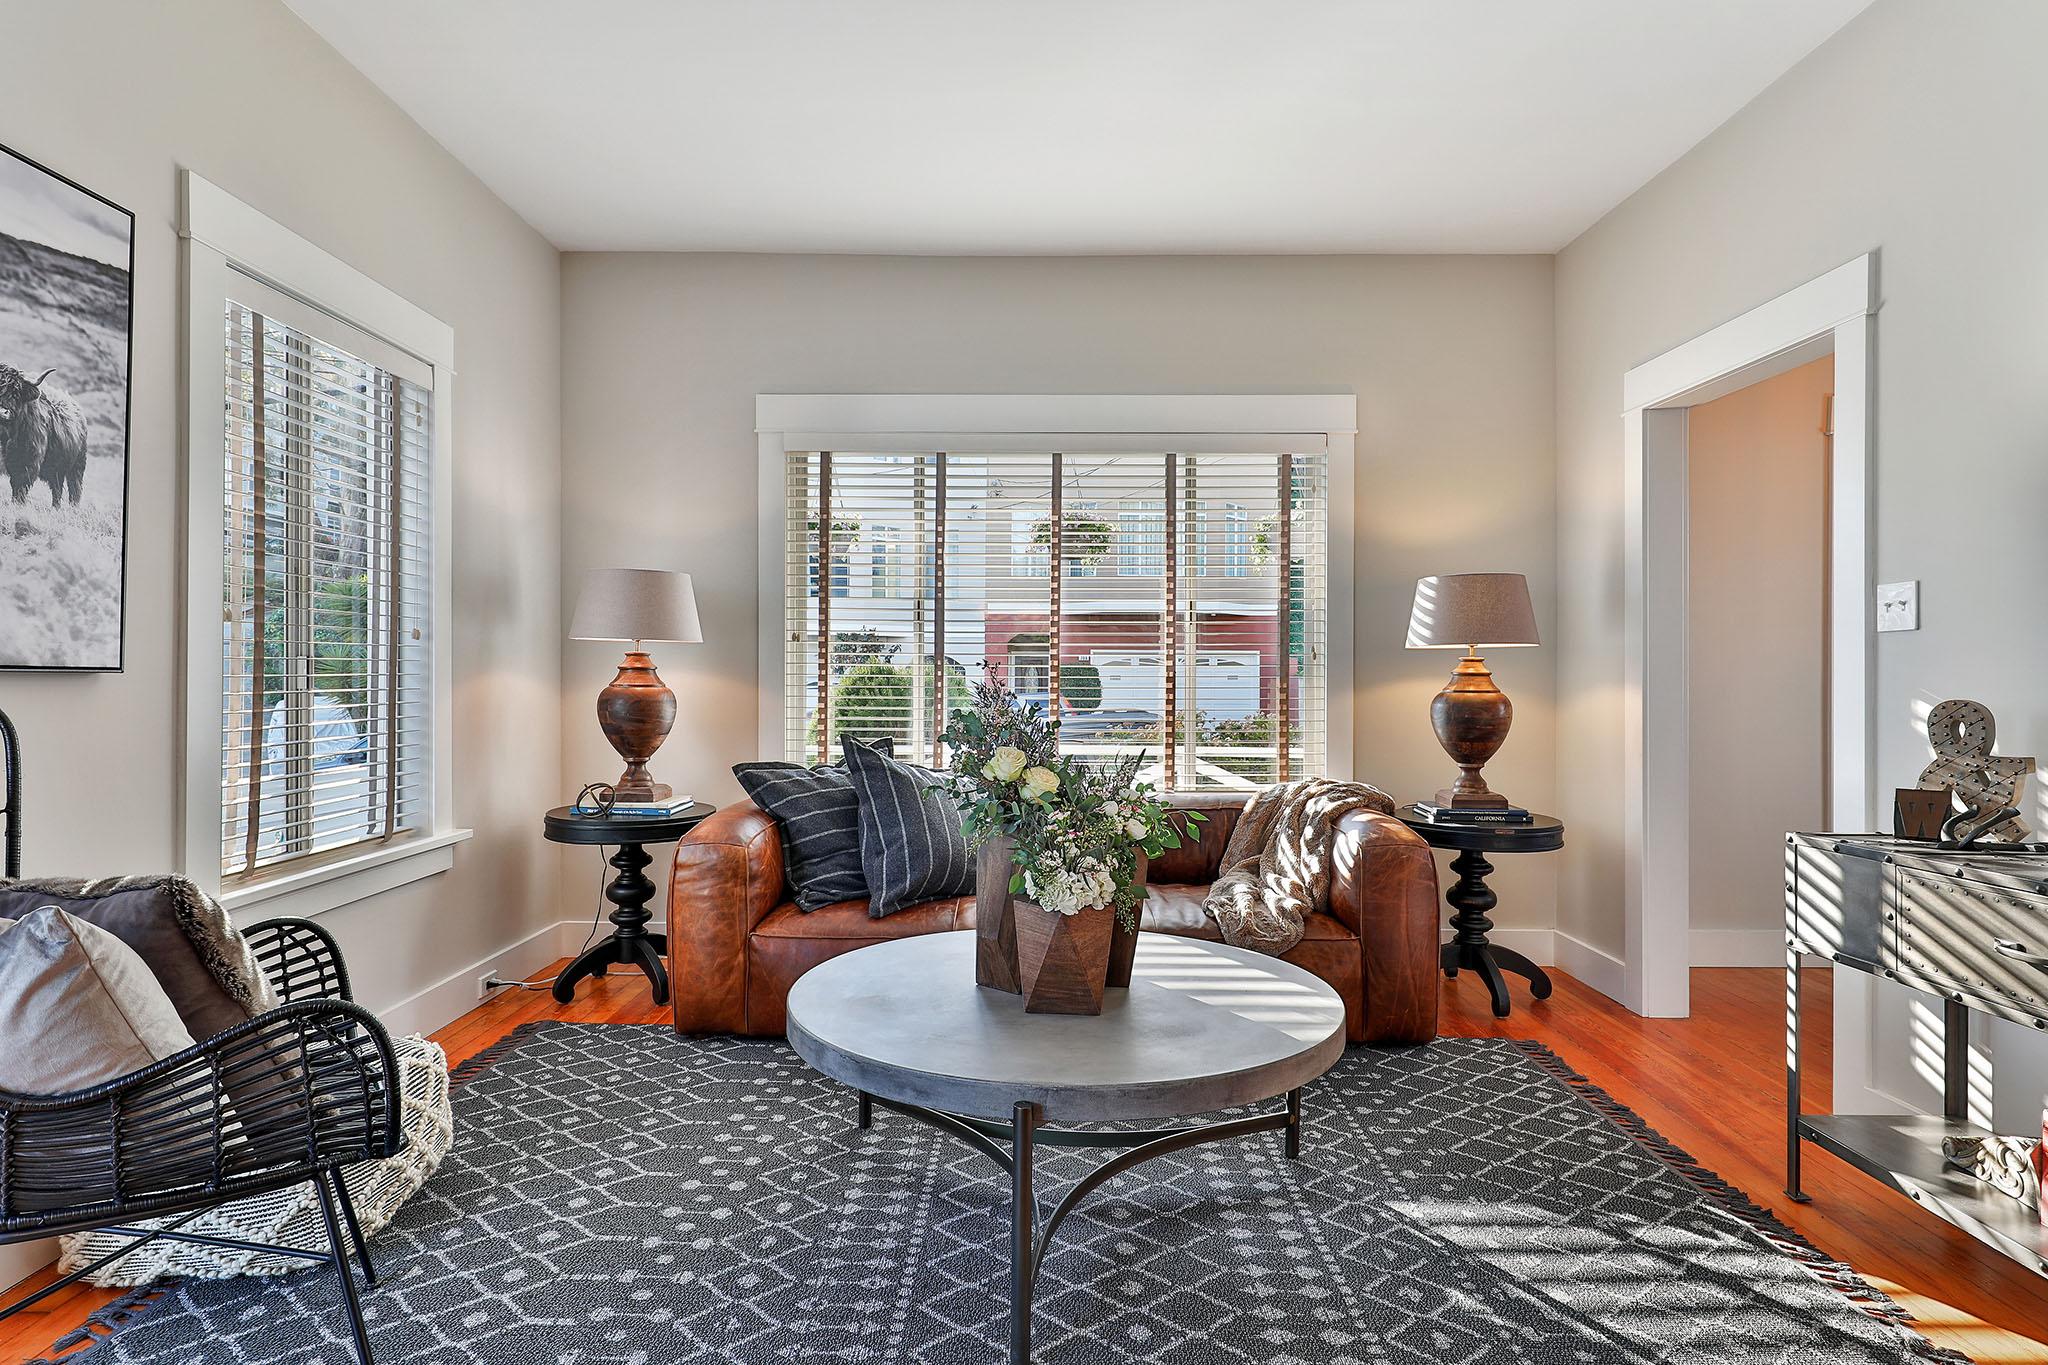 San Francisco Homes - Looking into living room